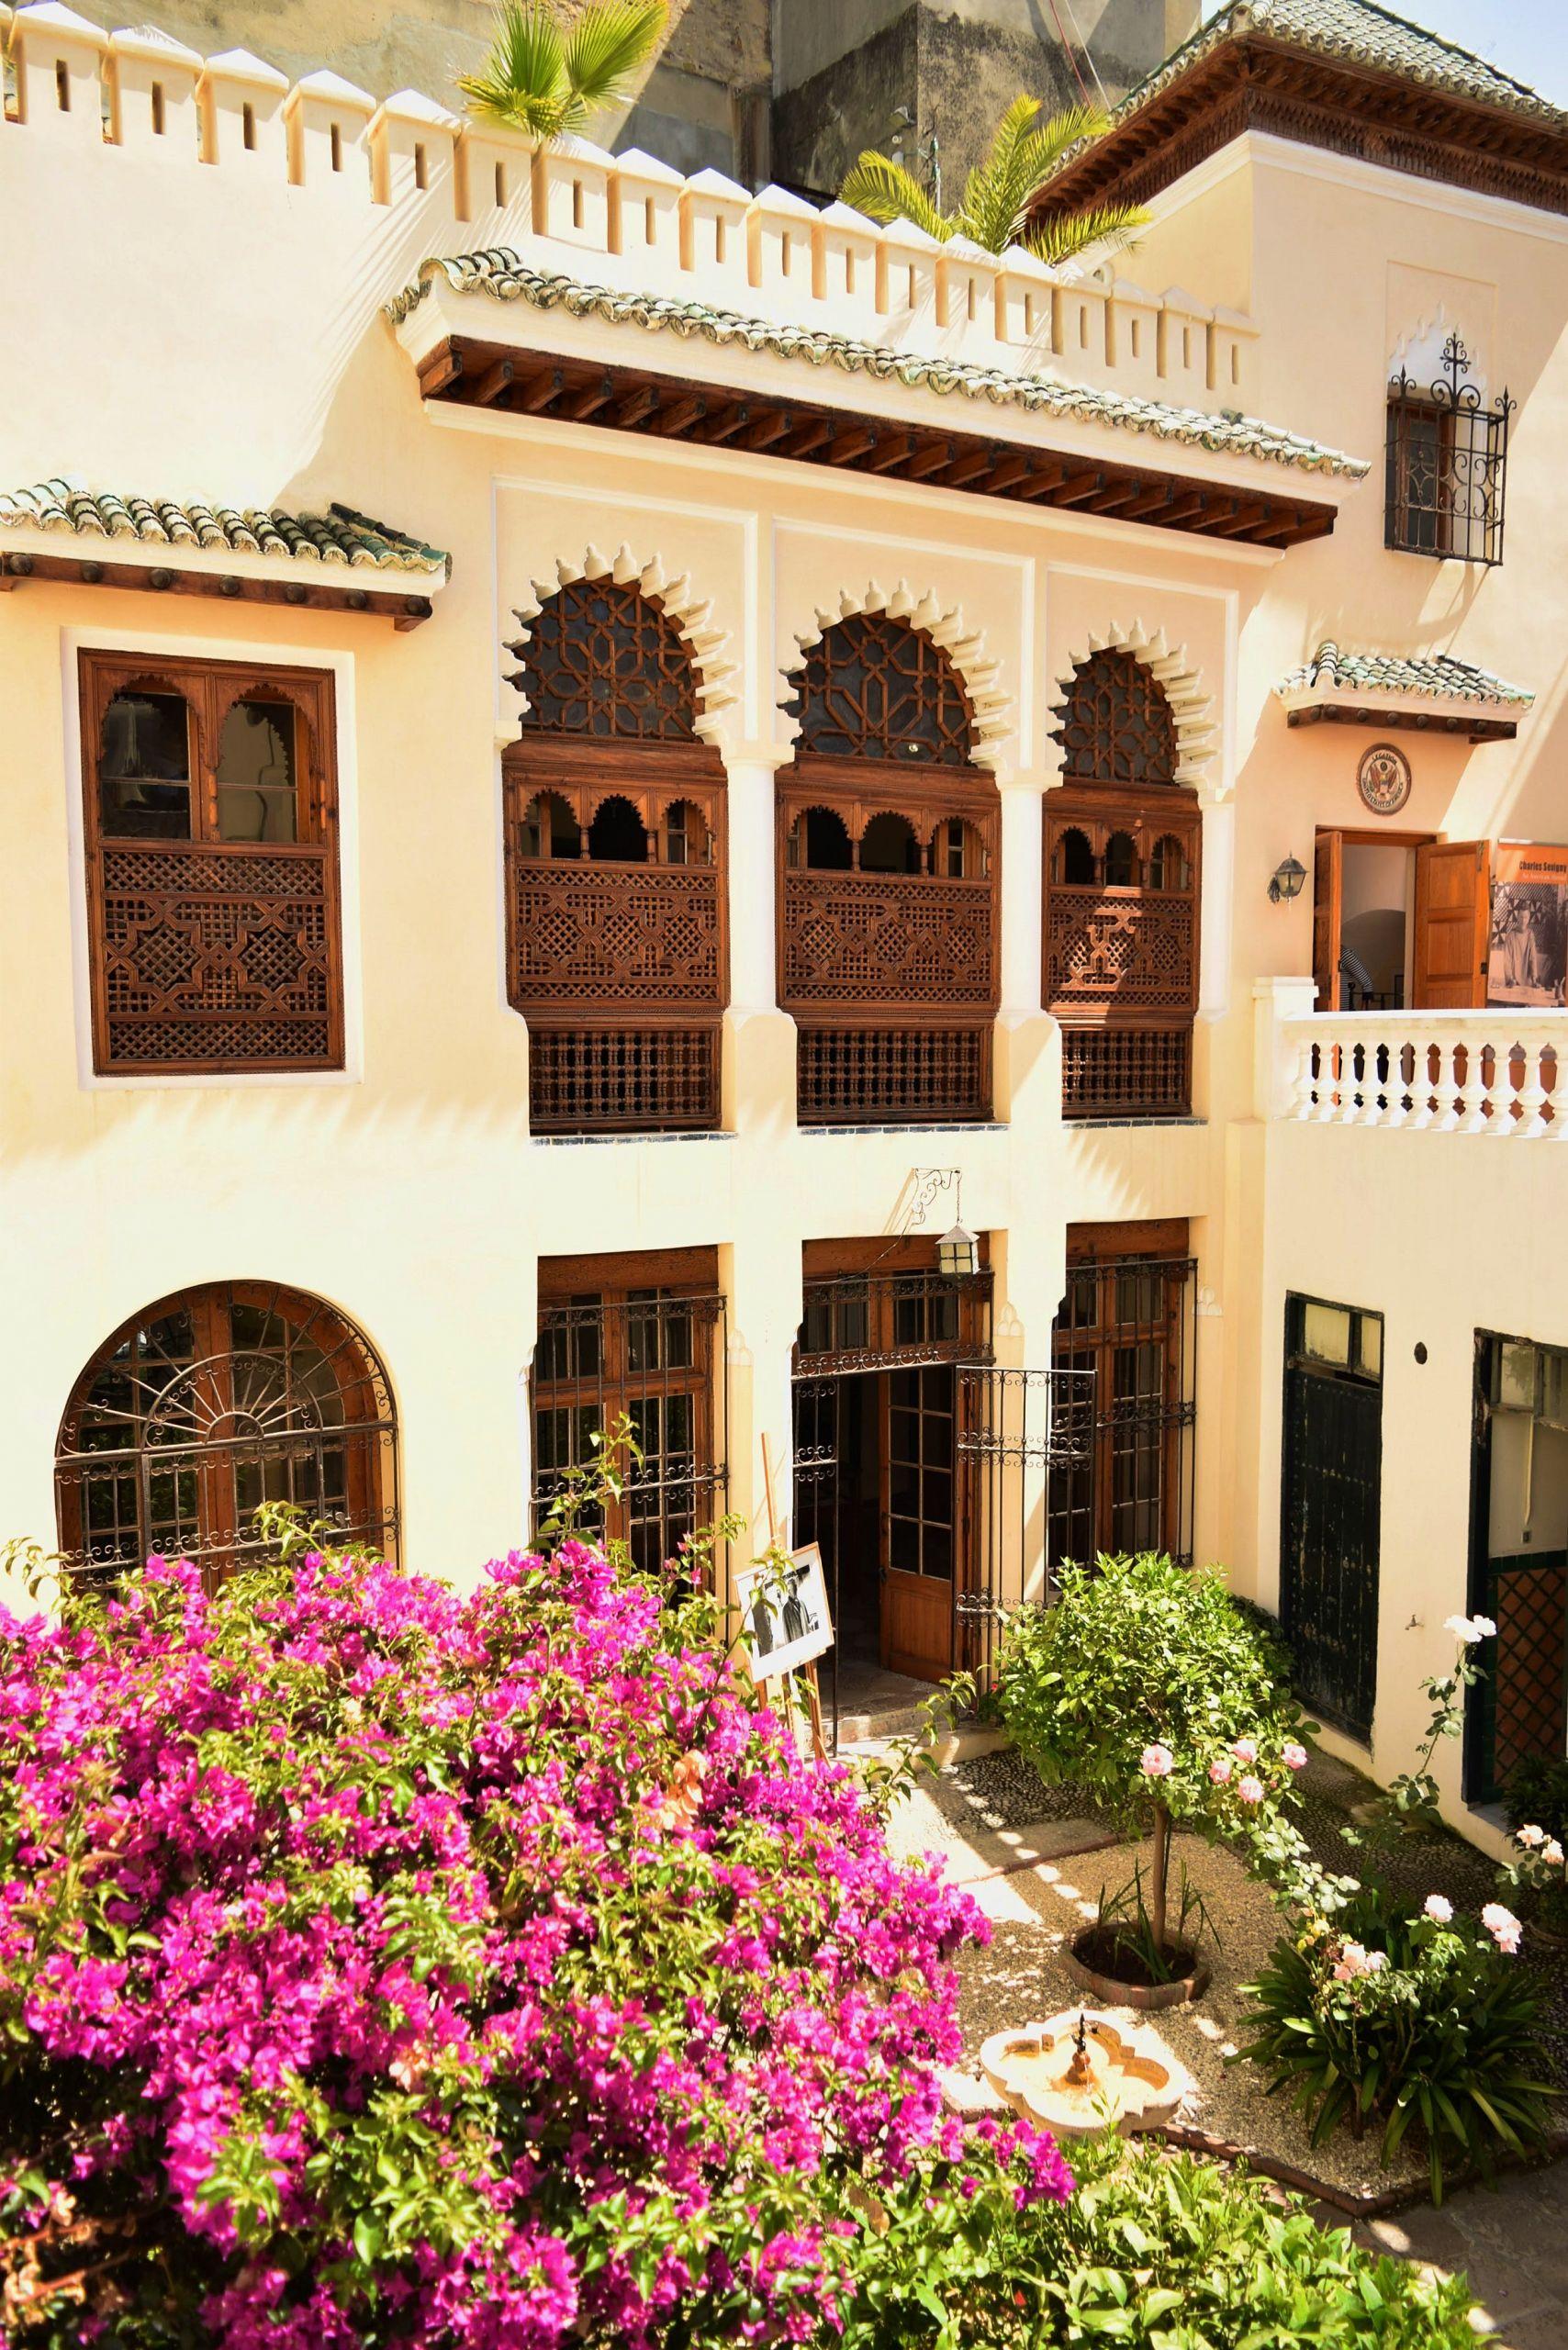 Tangier American Legation Museum